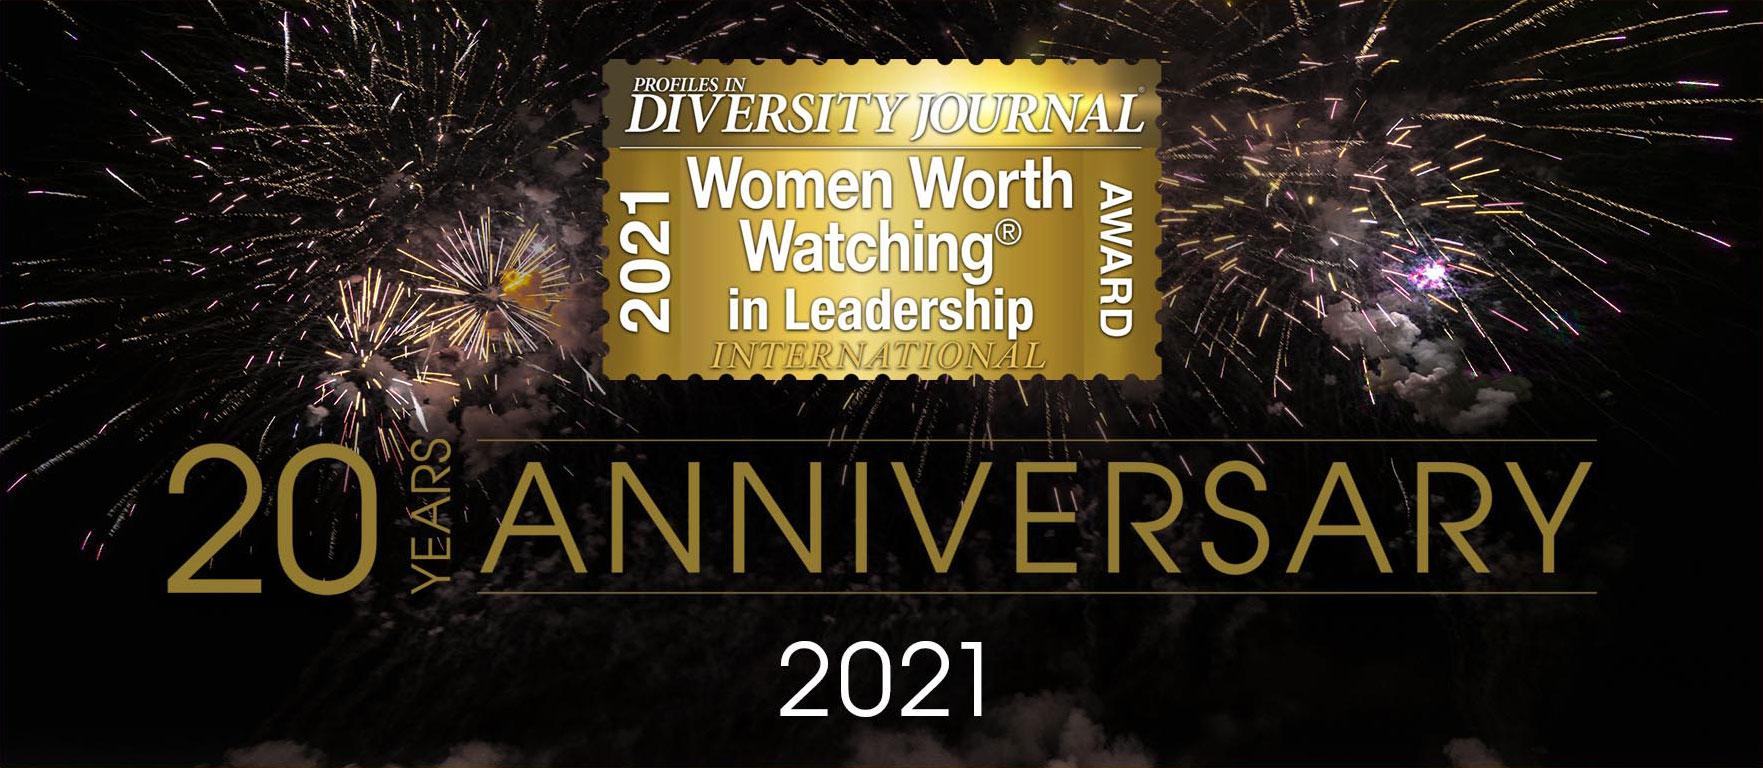 Profiles in Diversity Journal 2021 Women Worth Watching In Leadership International Award 20 Years Anniversary 2021